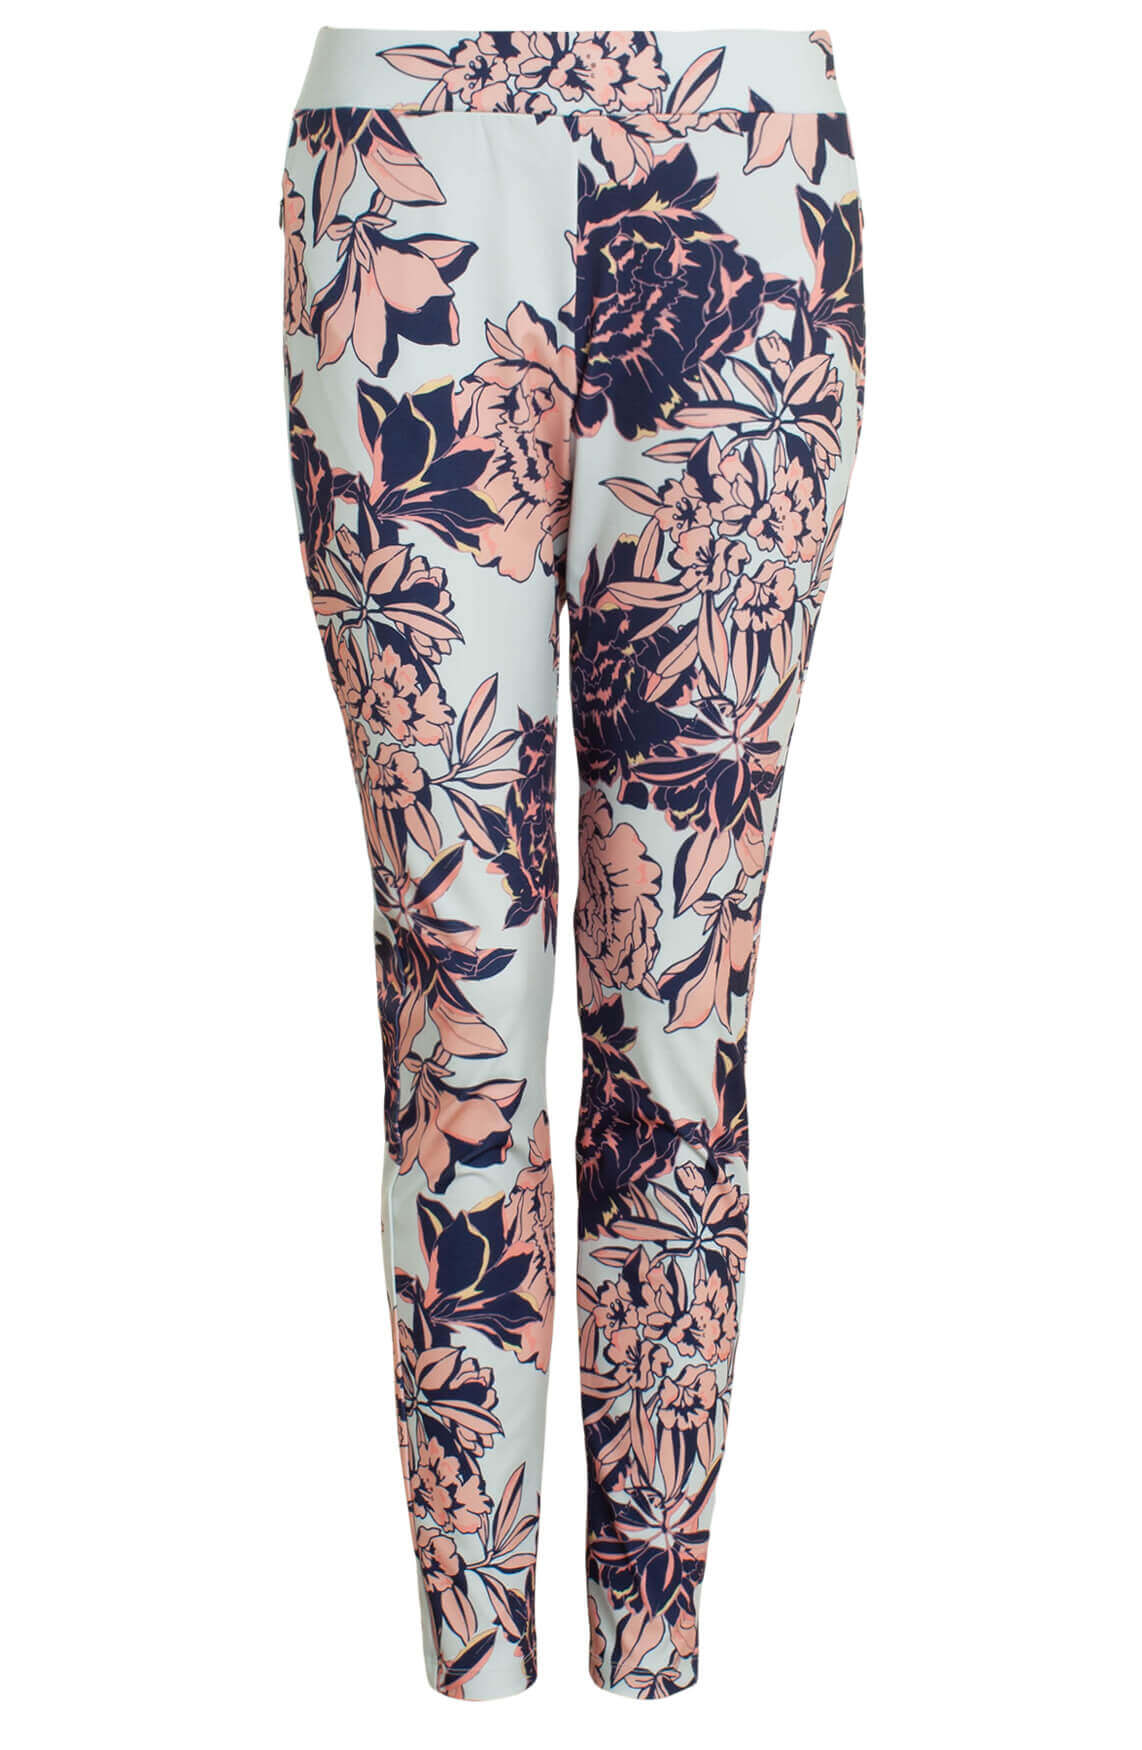 Anna Blue Dames Jersey sensitive broek met floral print Blauw